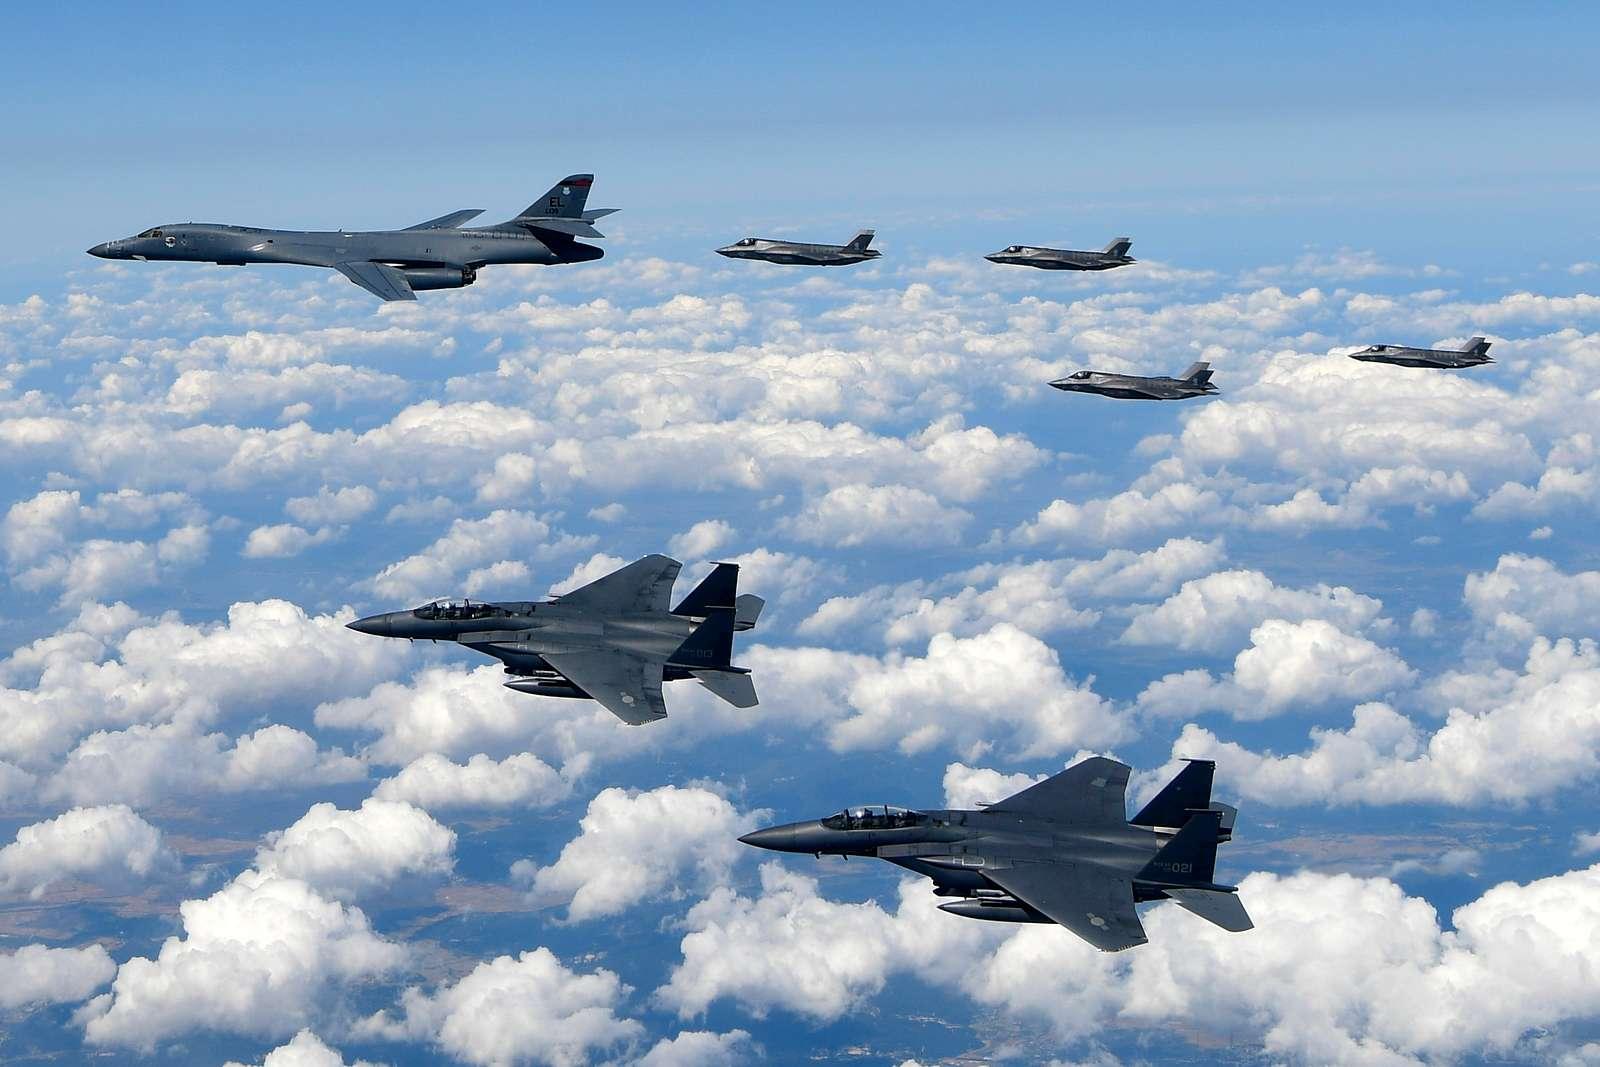 Rockwell B-1B Lancer with McDonnell Douglas F-15 Eagles and Lockheed Martin Aeronautics YF-22 Raptors